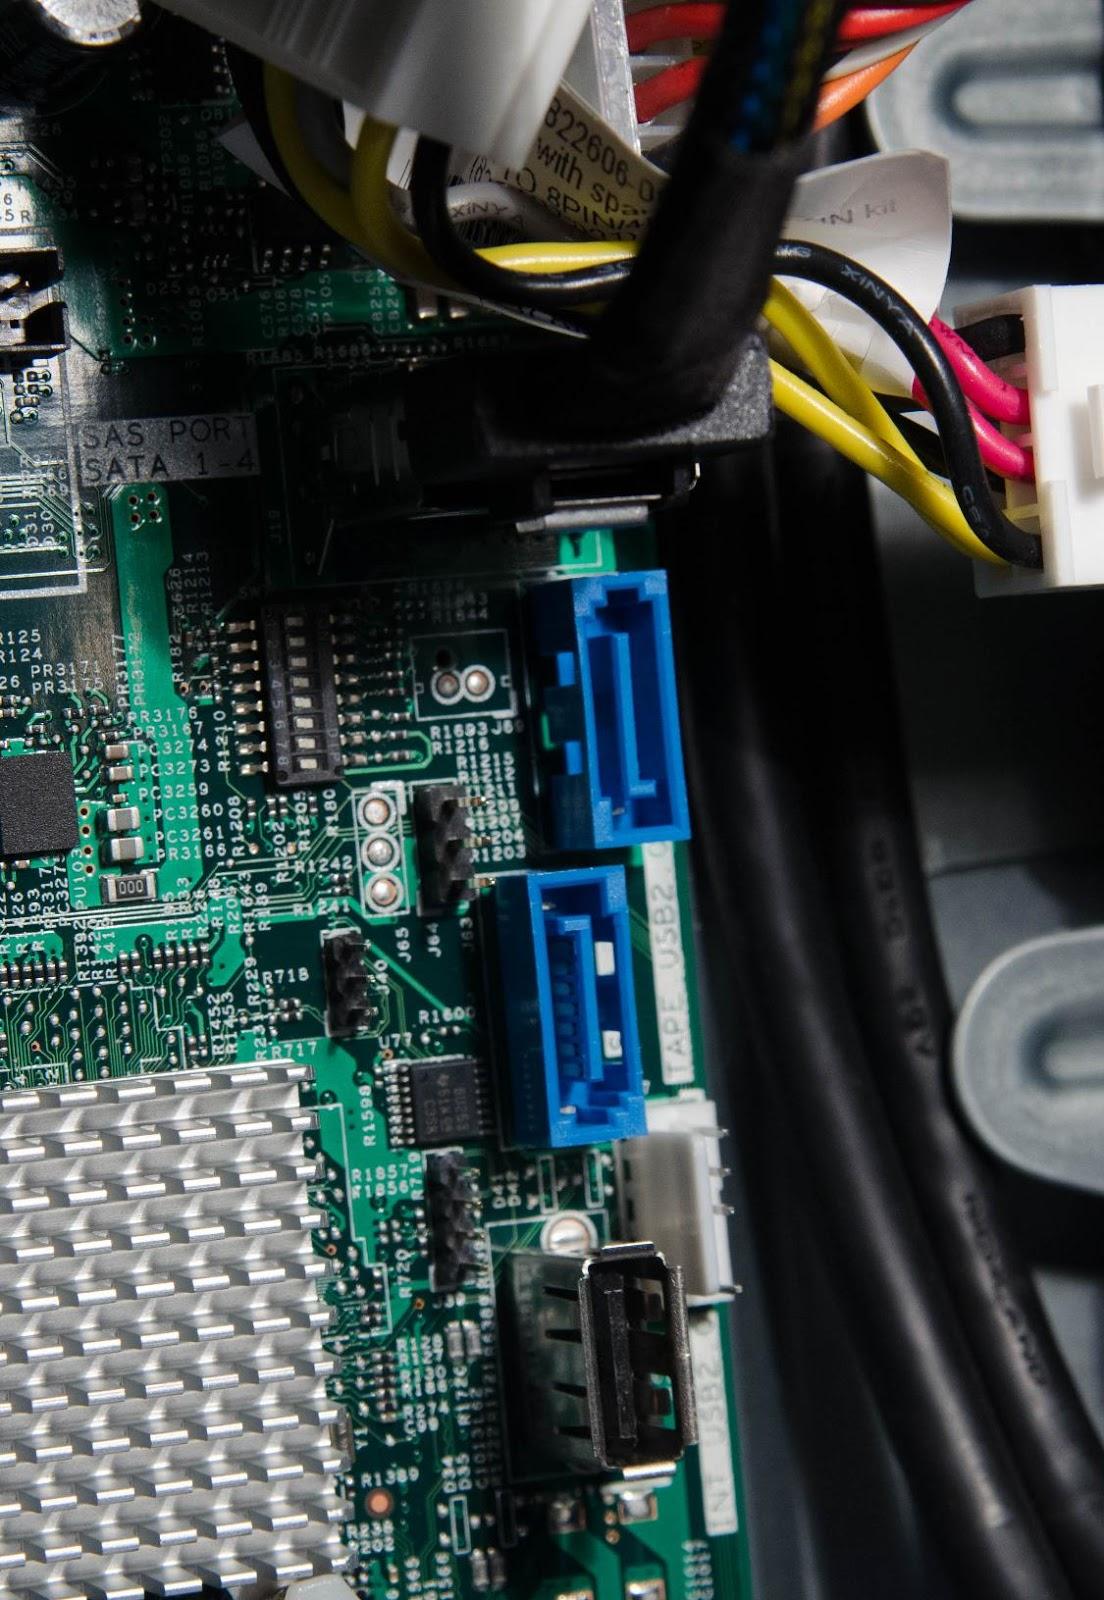 MаL, да удал: Обзор младших серверов линейки HPE ProLiant ML - 12